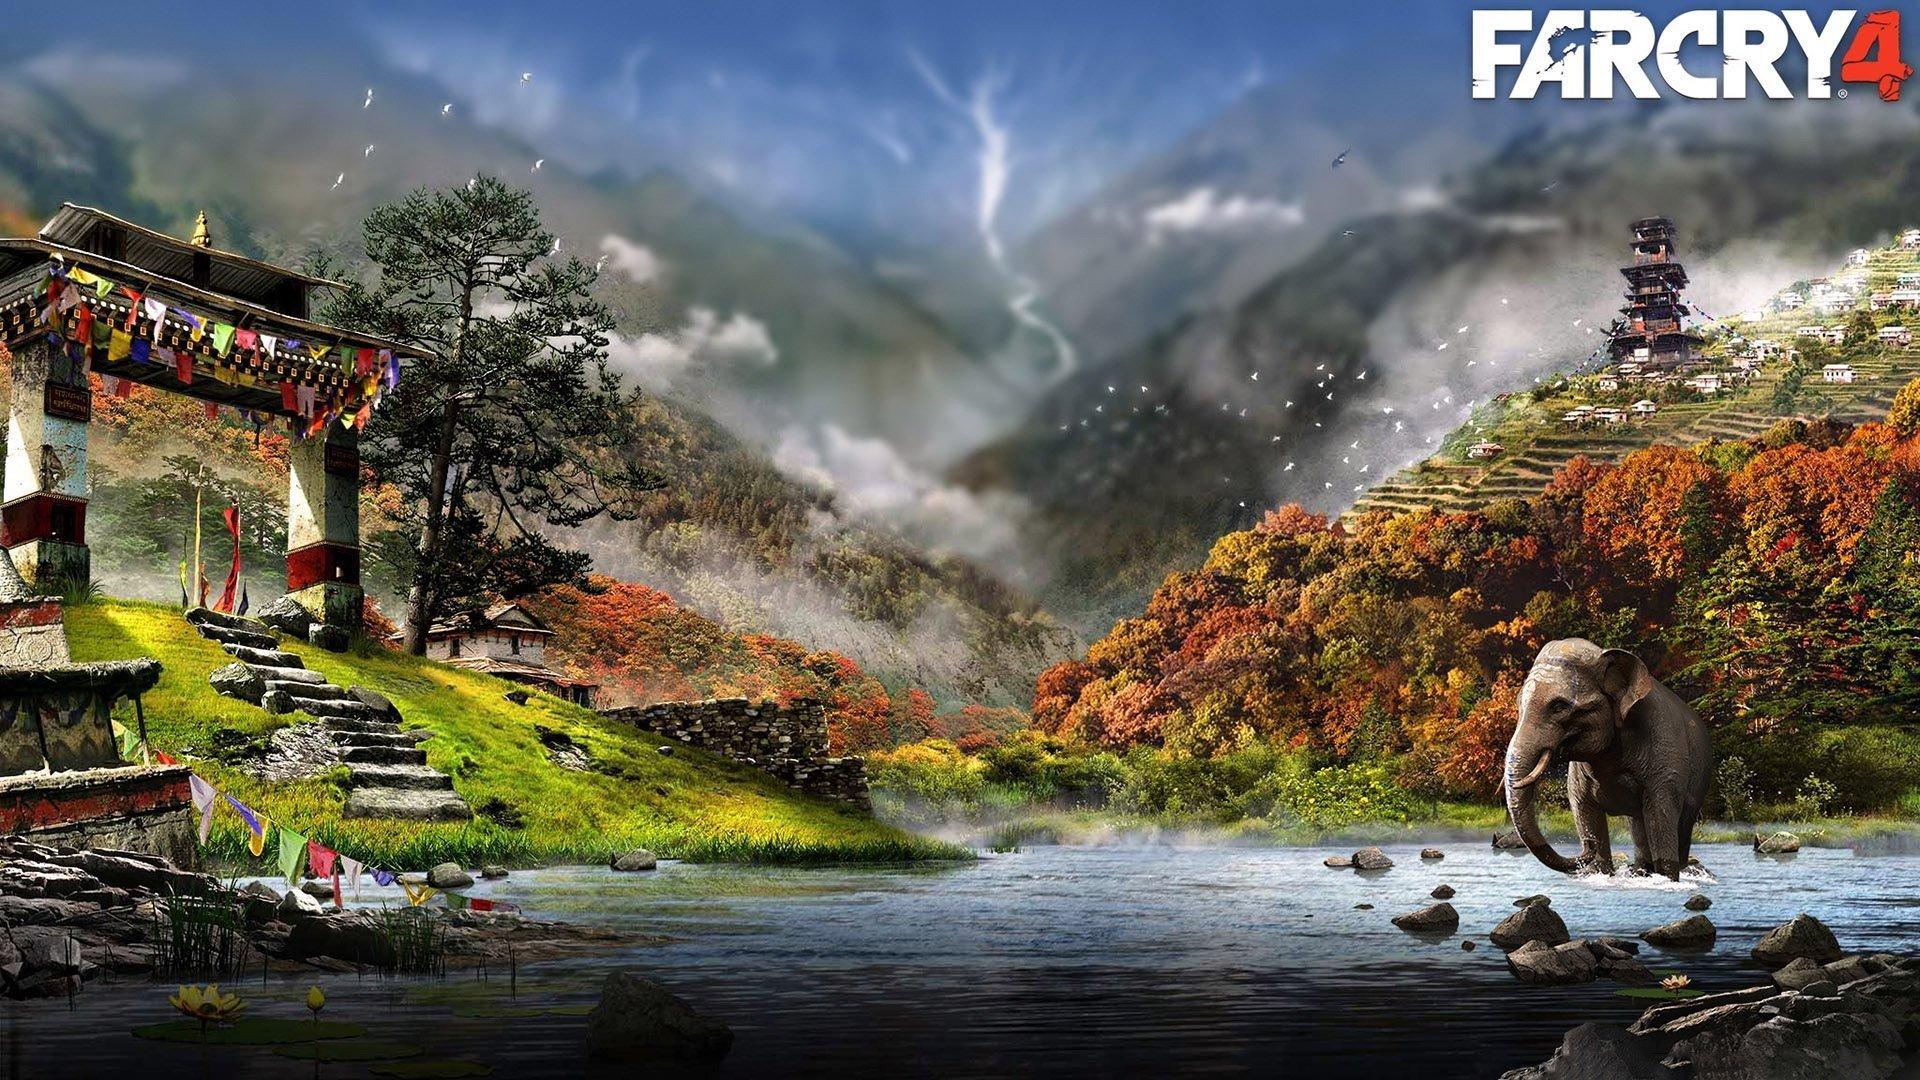 Wallpaper Video Games Far Cry 4 Elephant 1920x1080 Utp